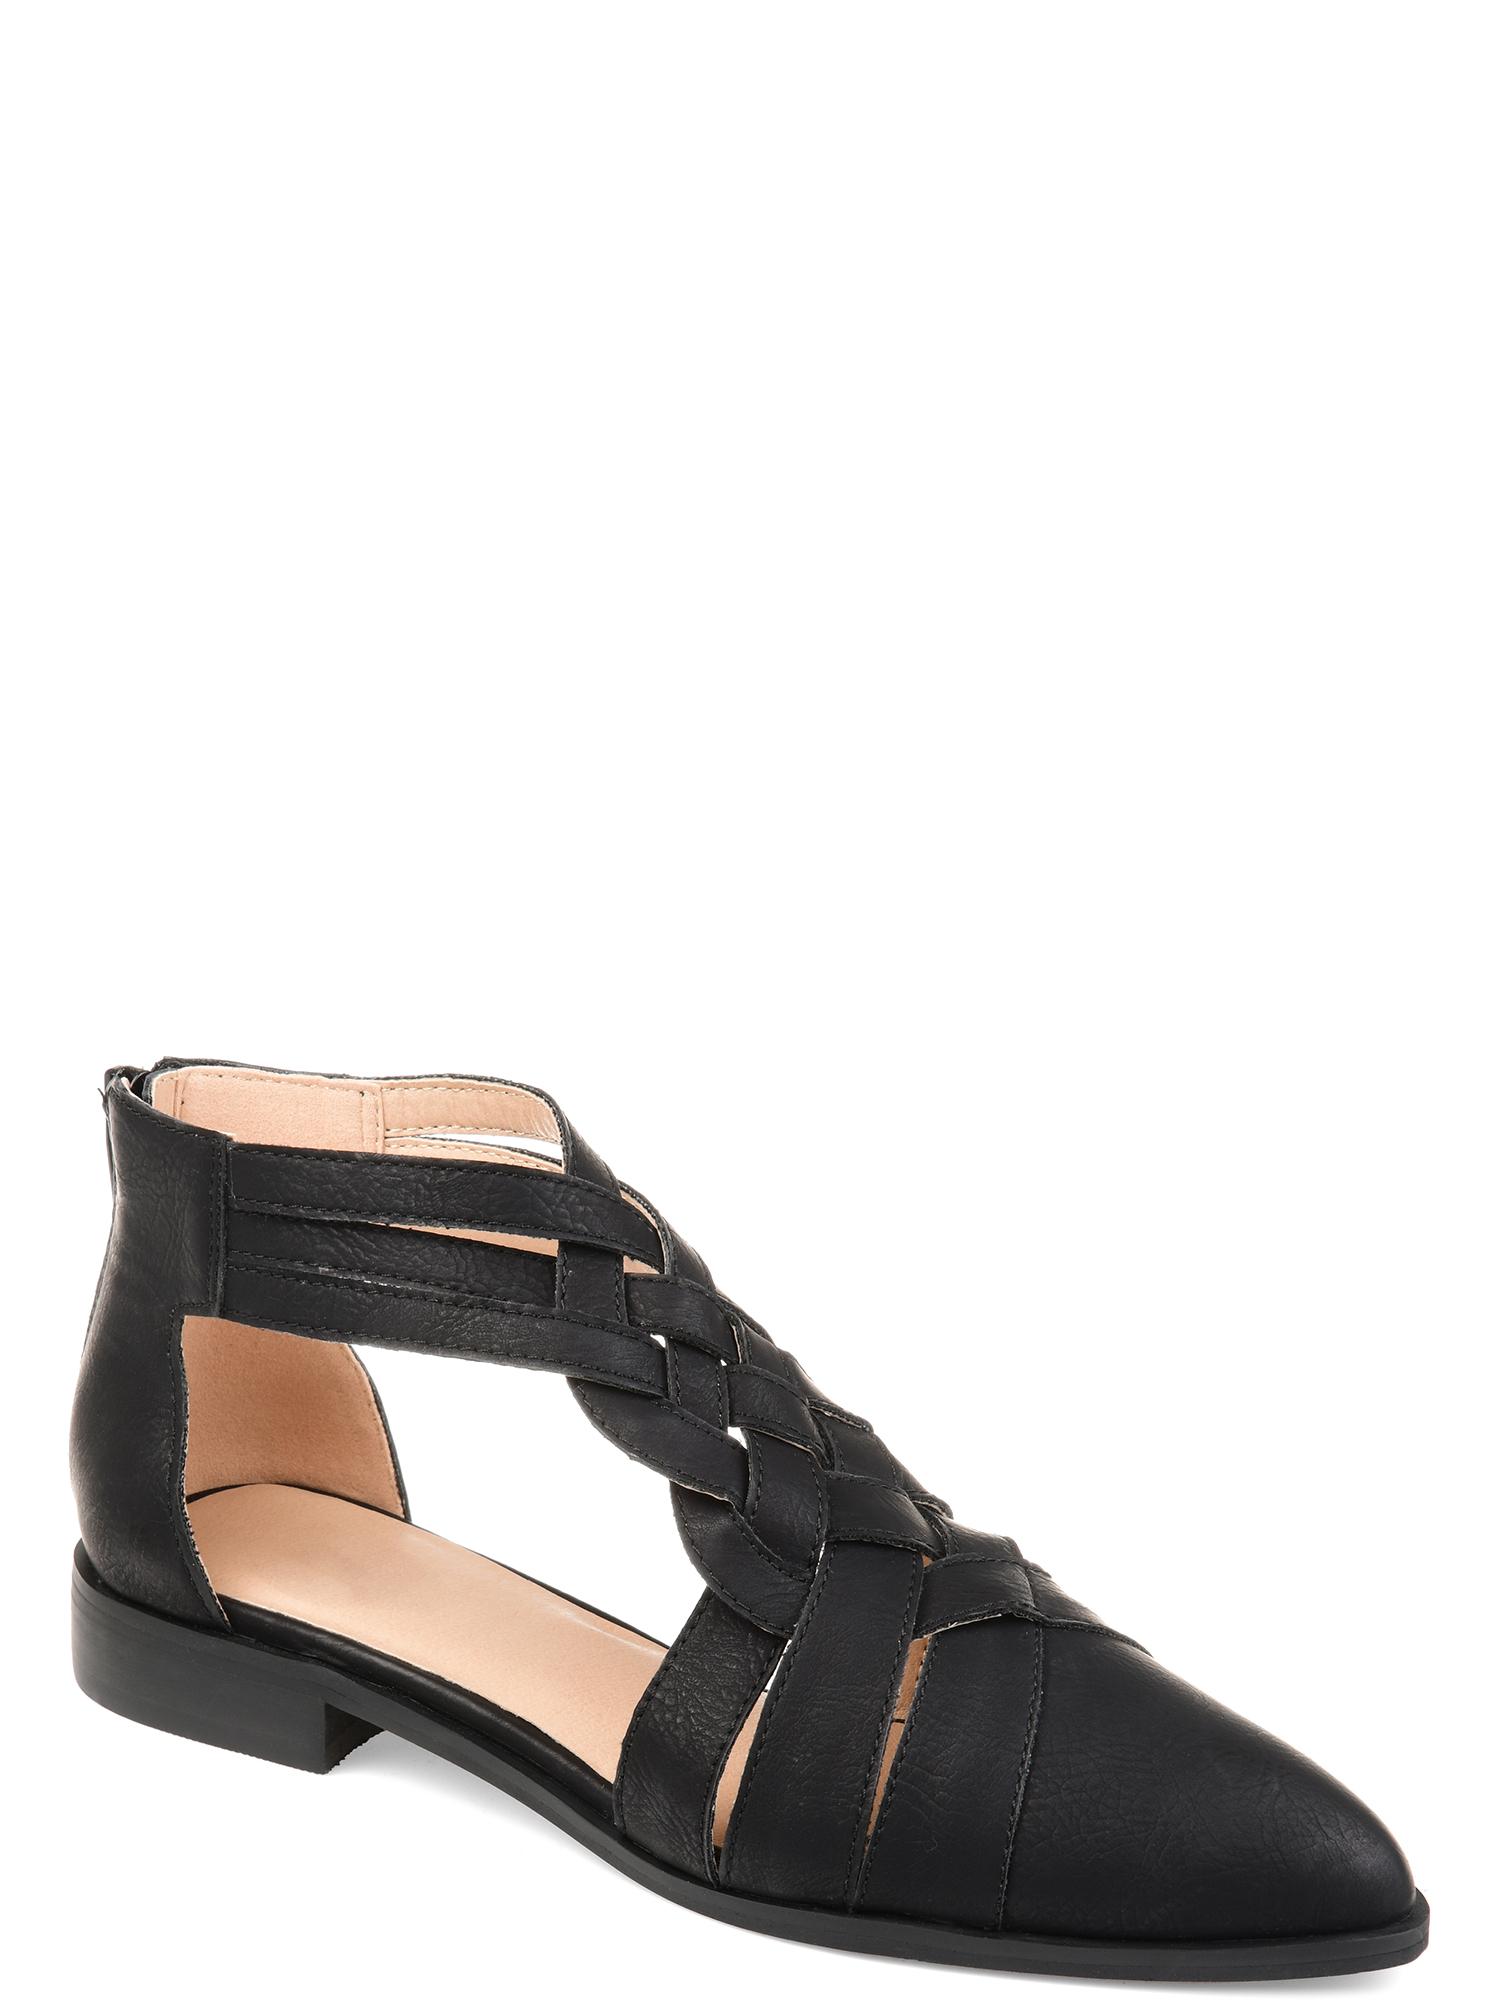 Brinley Co. Women's Woven Detail Flat Shoe